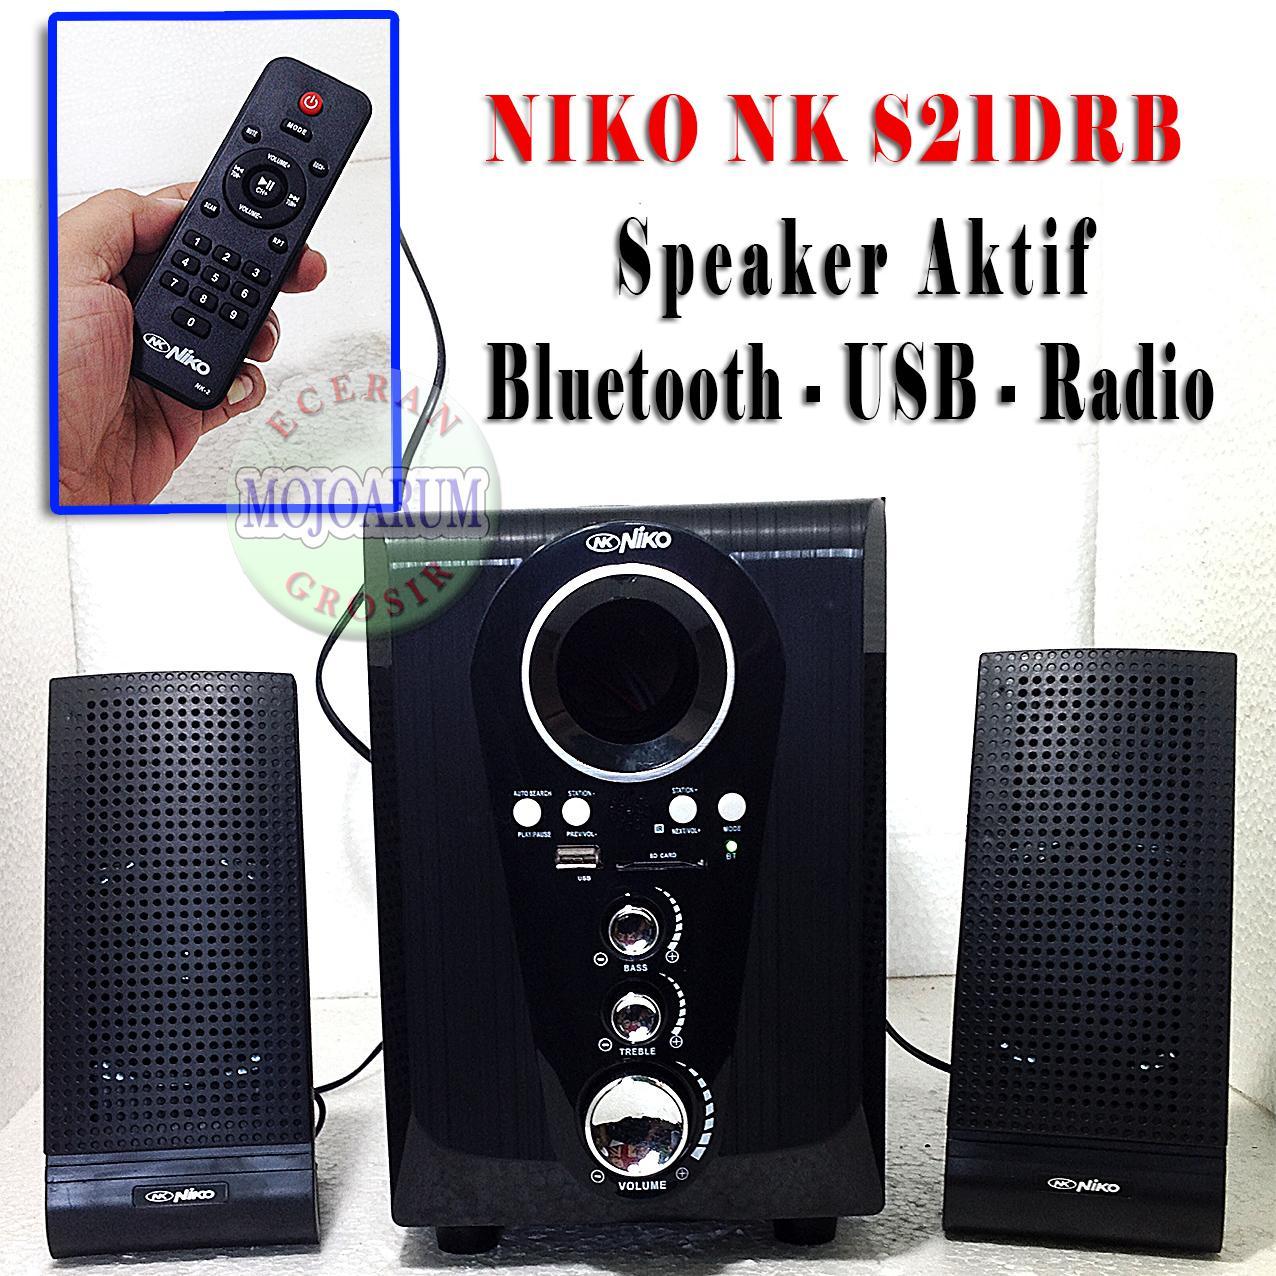 Detail Gambar Speaker Aktif NIKO S21DRB Original Bluetooth FM Radio USB Memory Active - Mojoarum Grosir